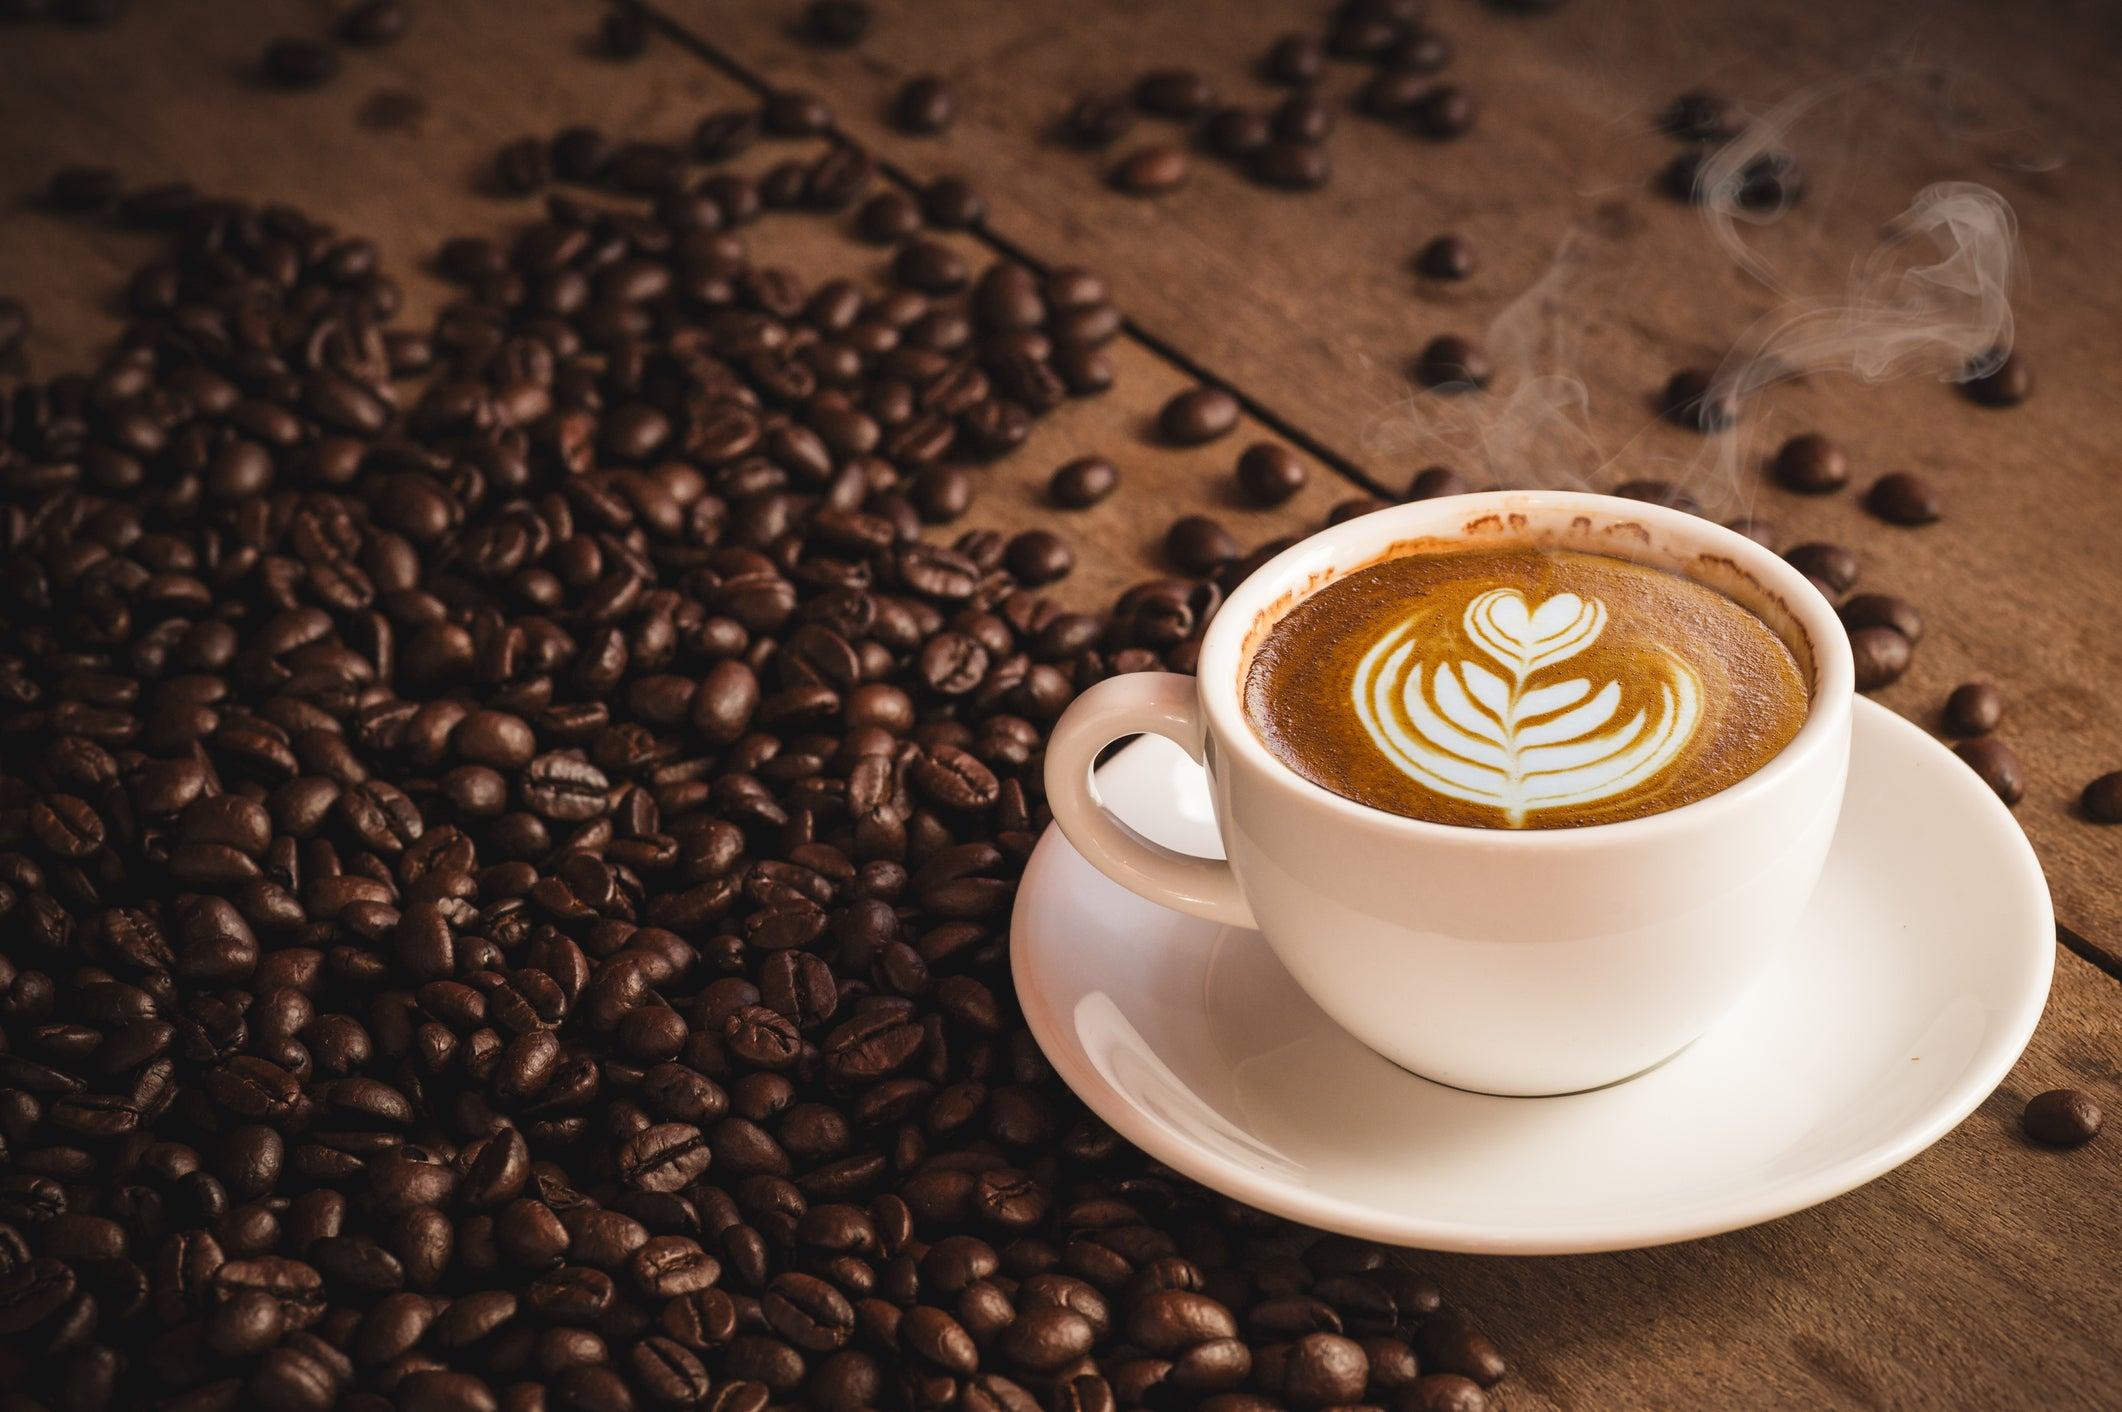 Best Coffee Shops In Santa Cruz, California